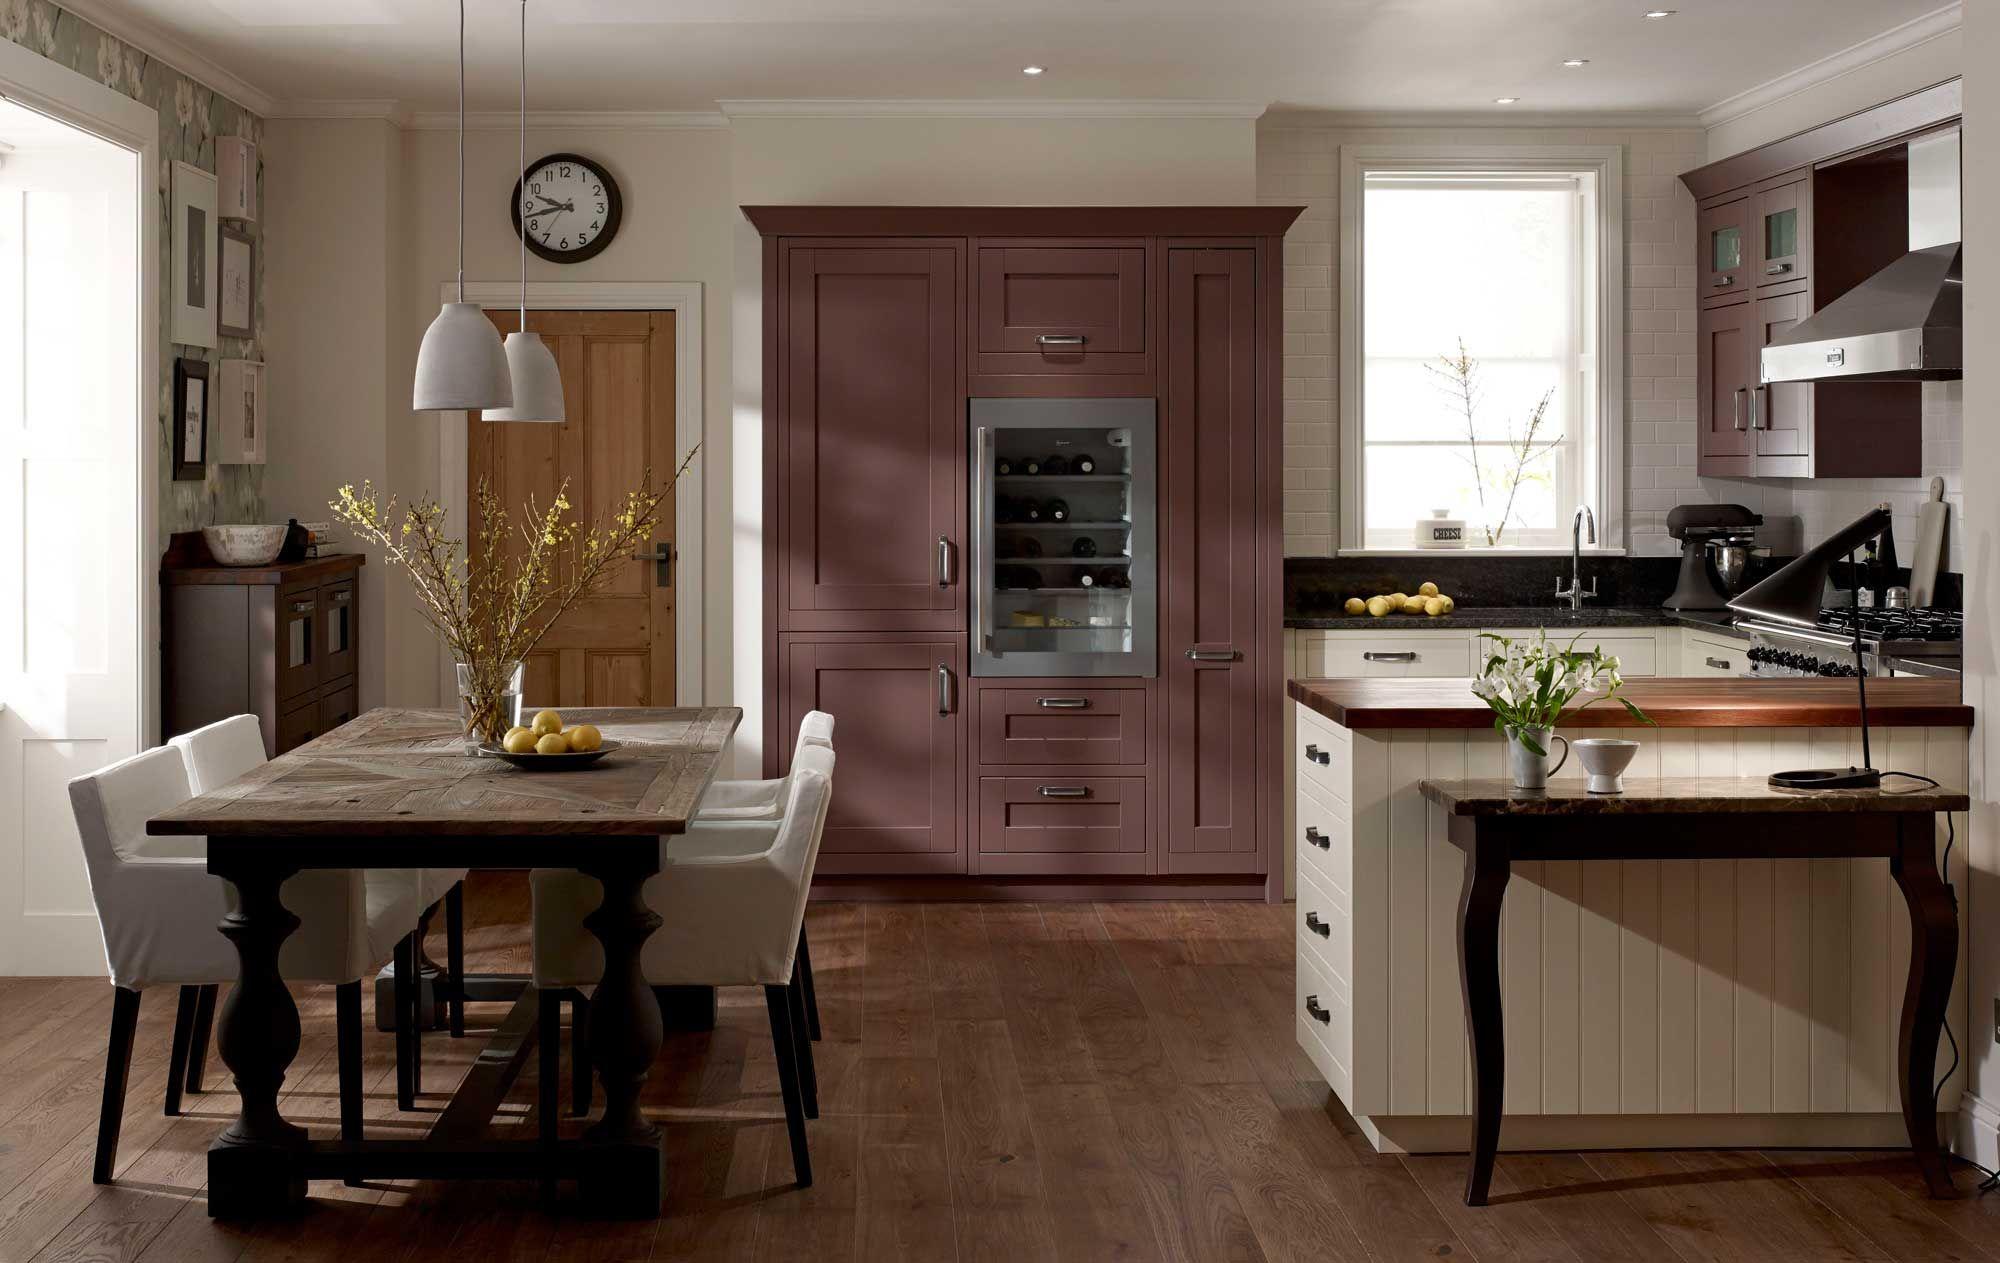 Kitchen cabinets erdington birmingham wholesale alabama image quotes